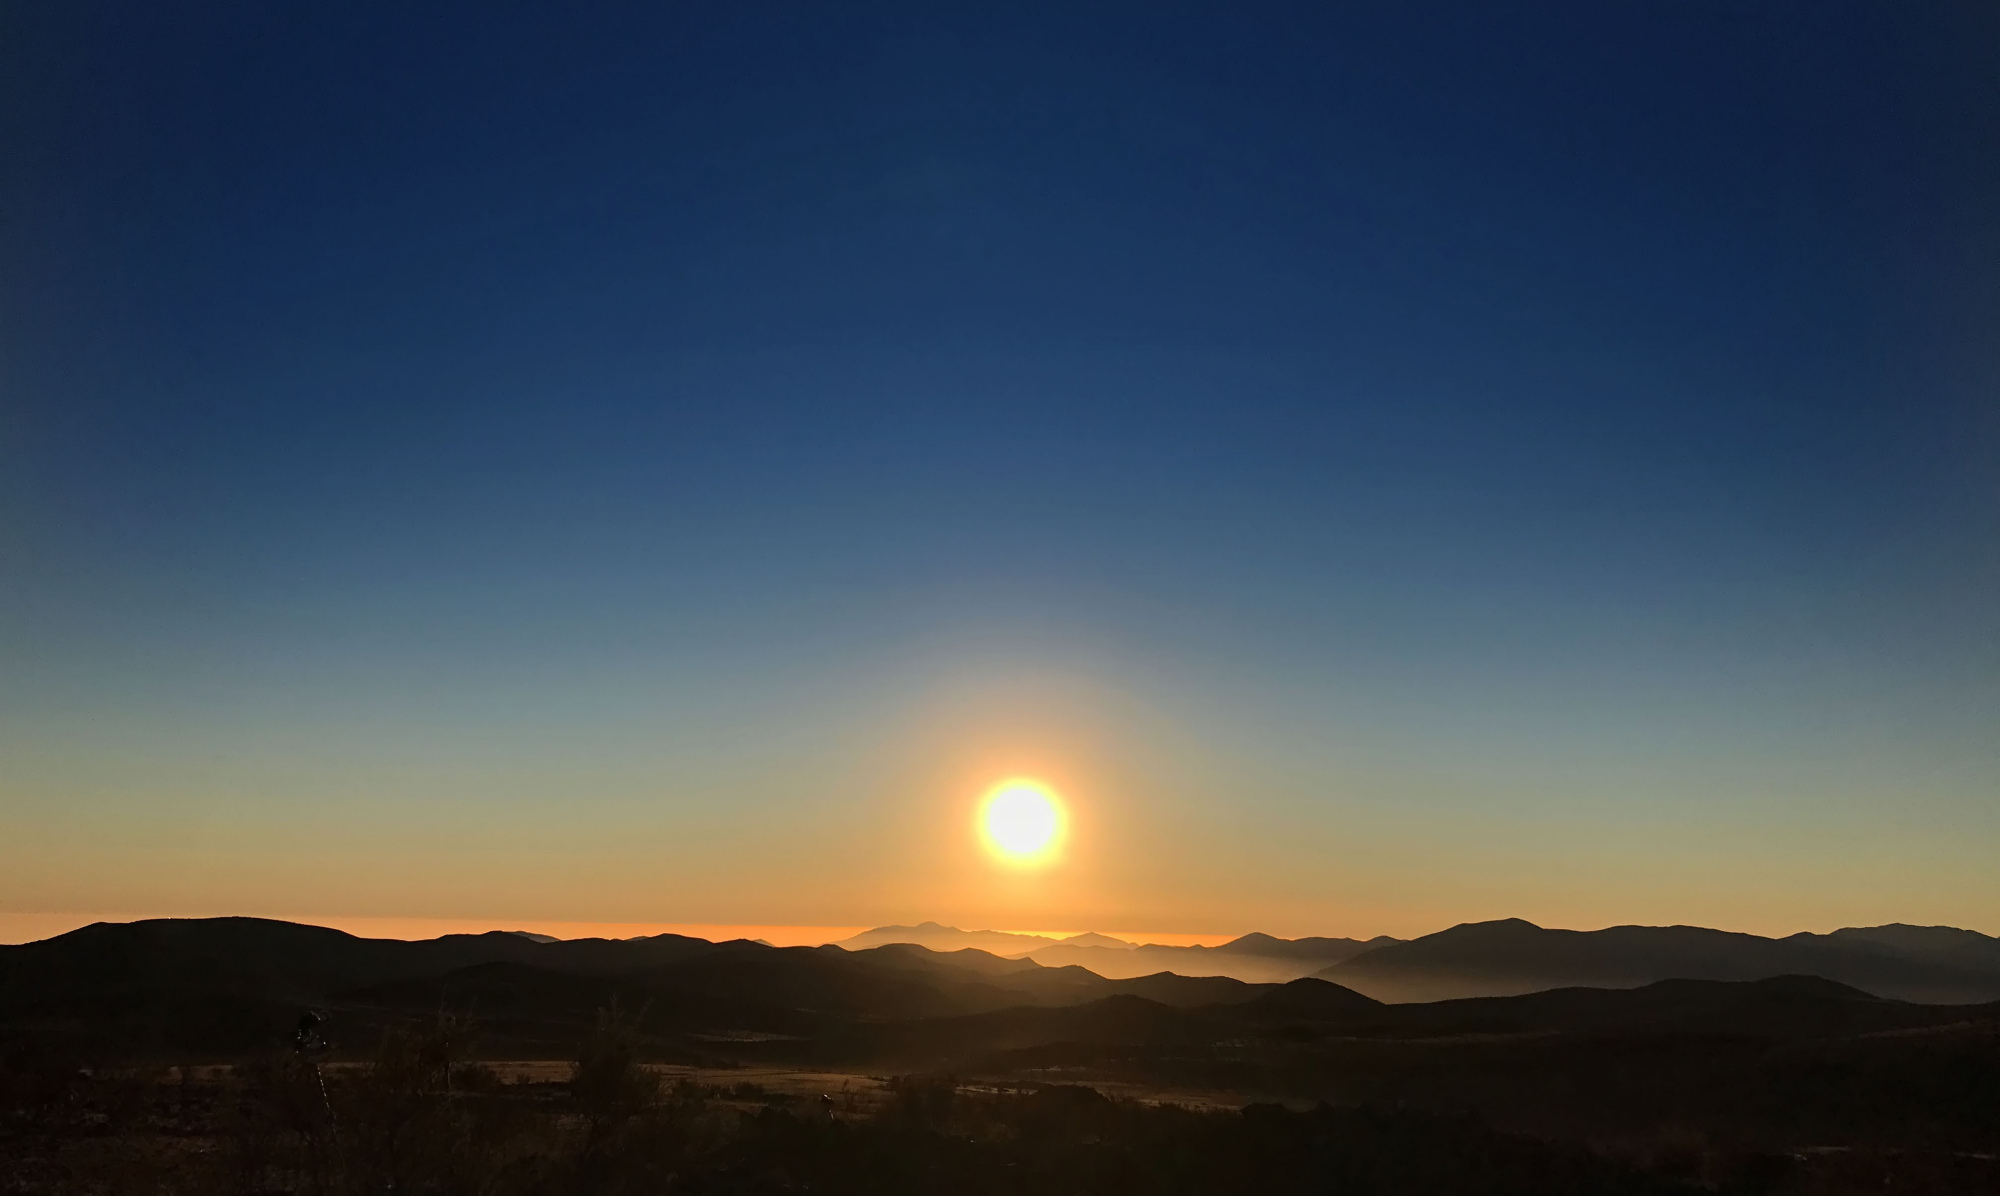 3 Soleil CHILI 2853N1B3 send.jpg